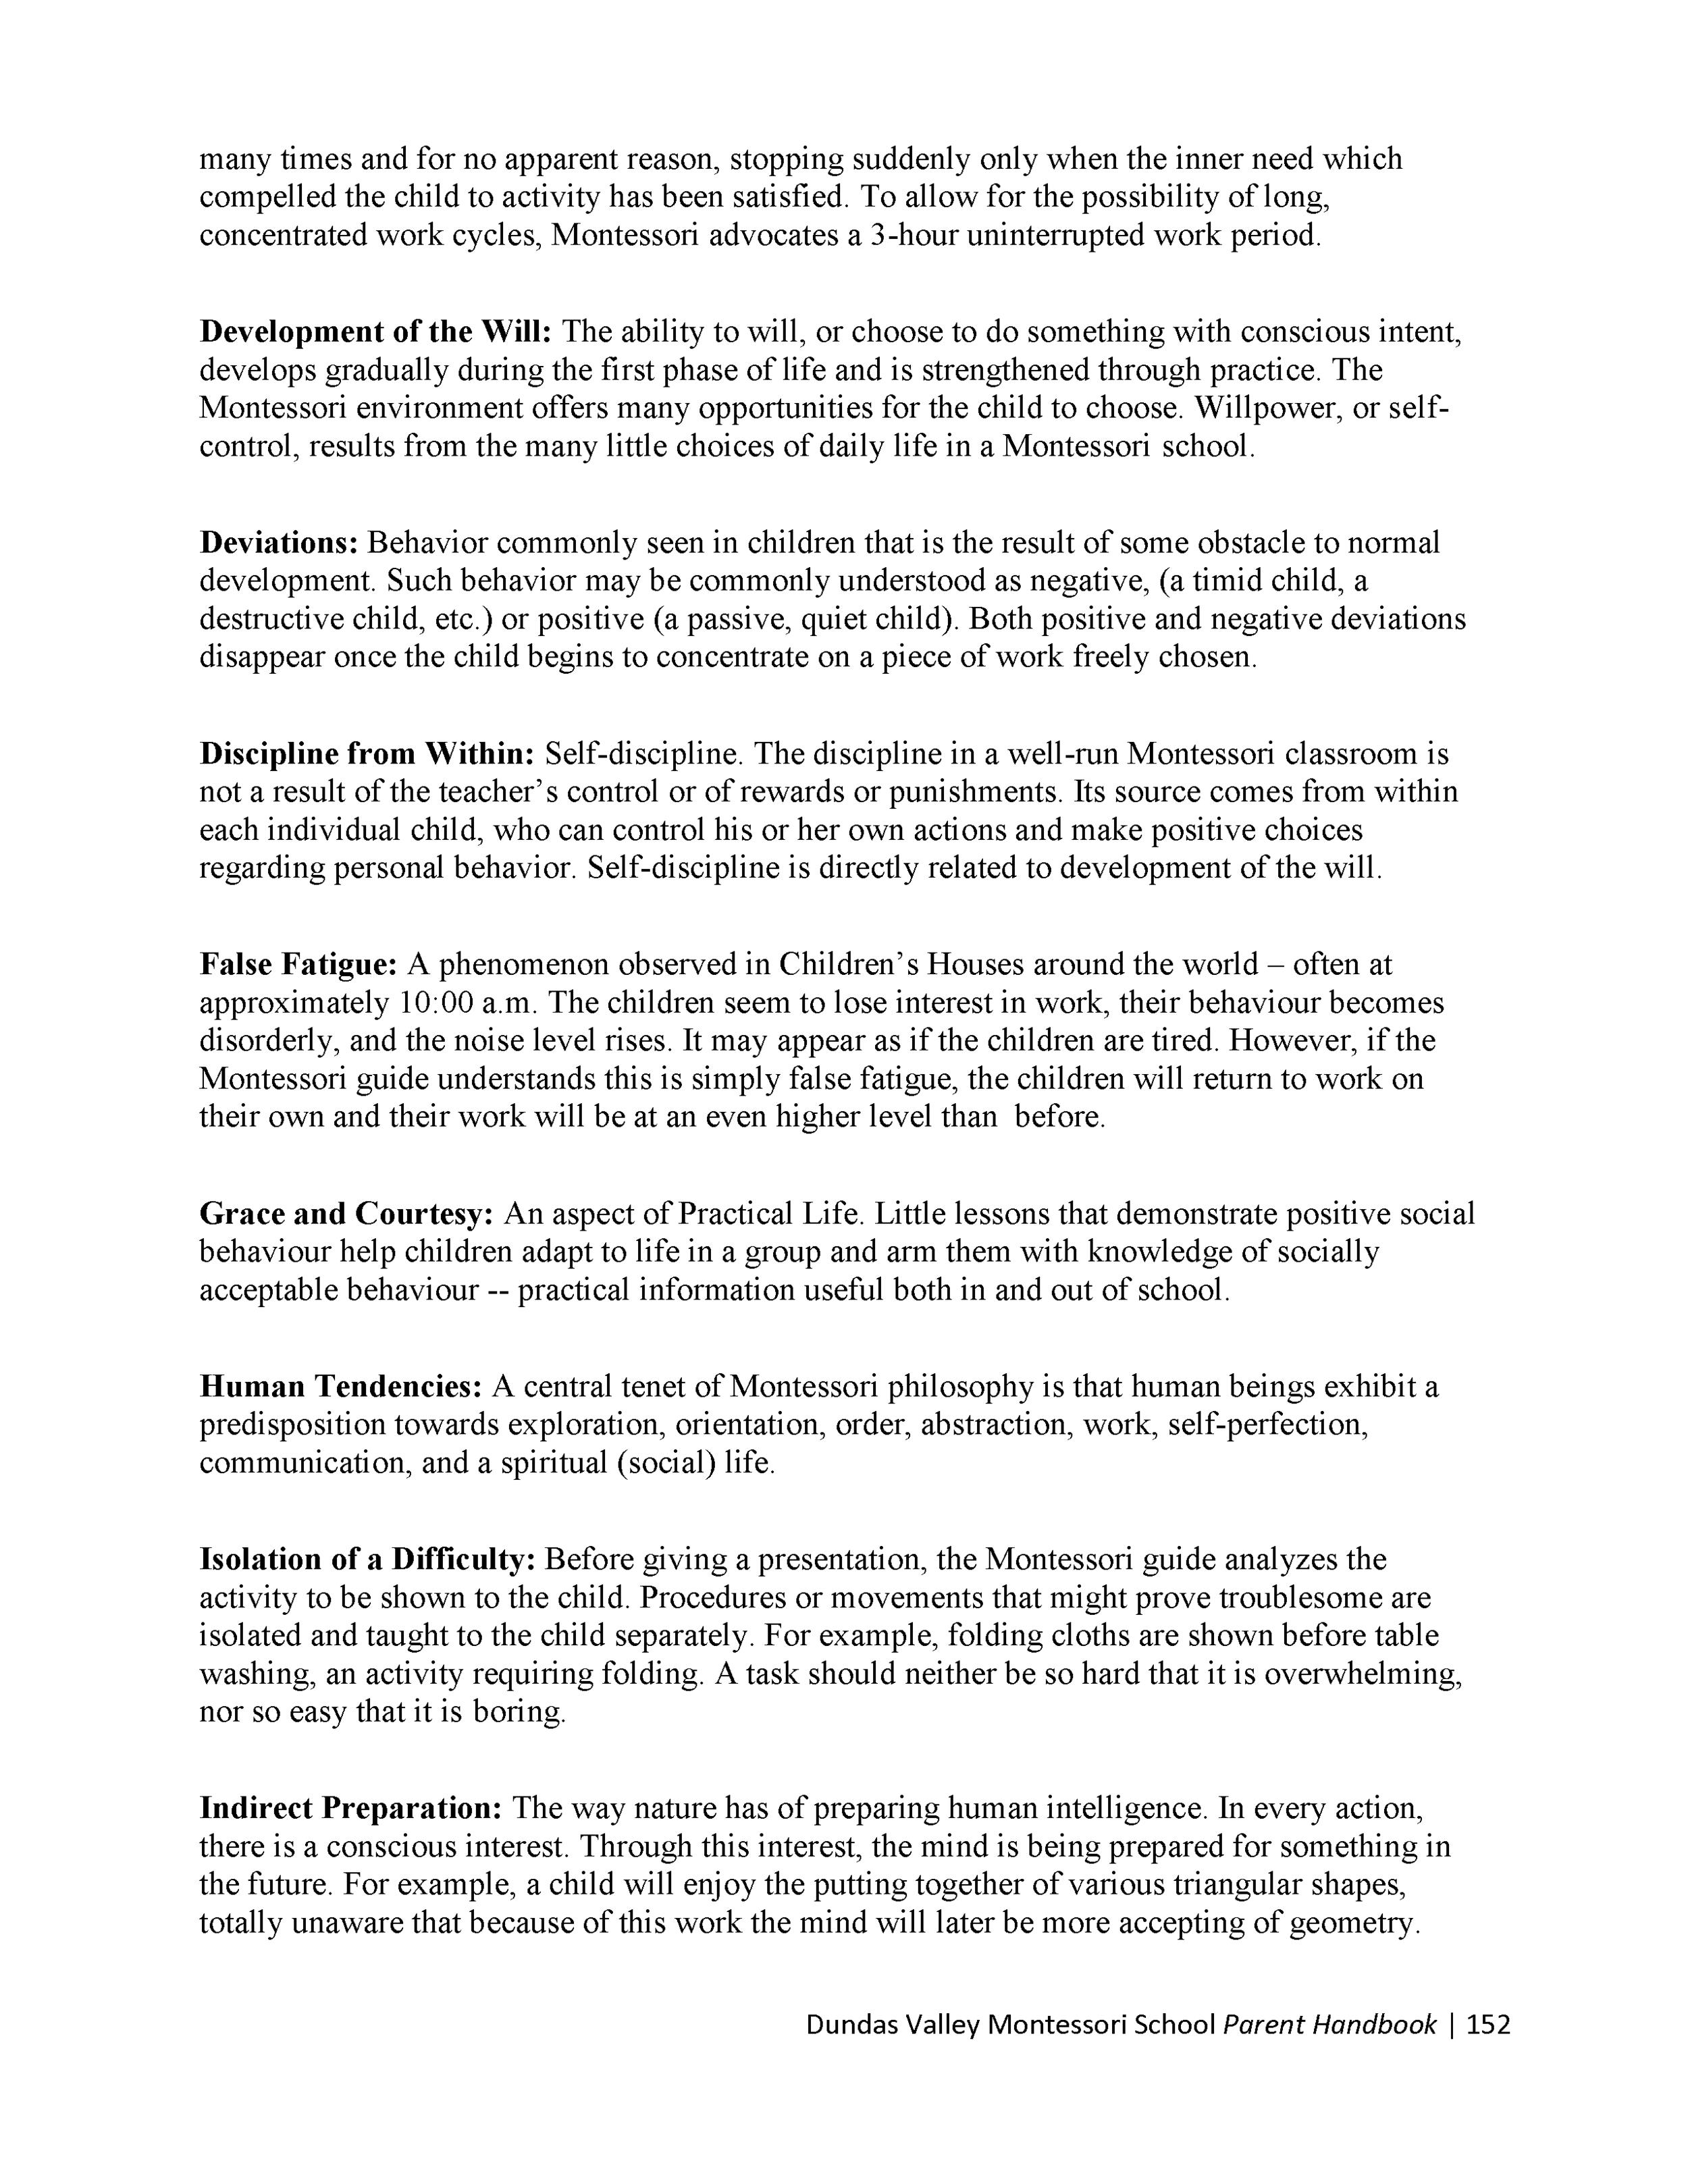 DVMS-Parent-Handbook-19-20_Page_154.png